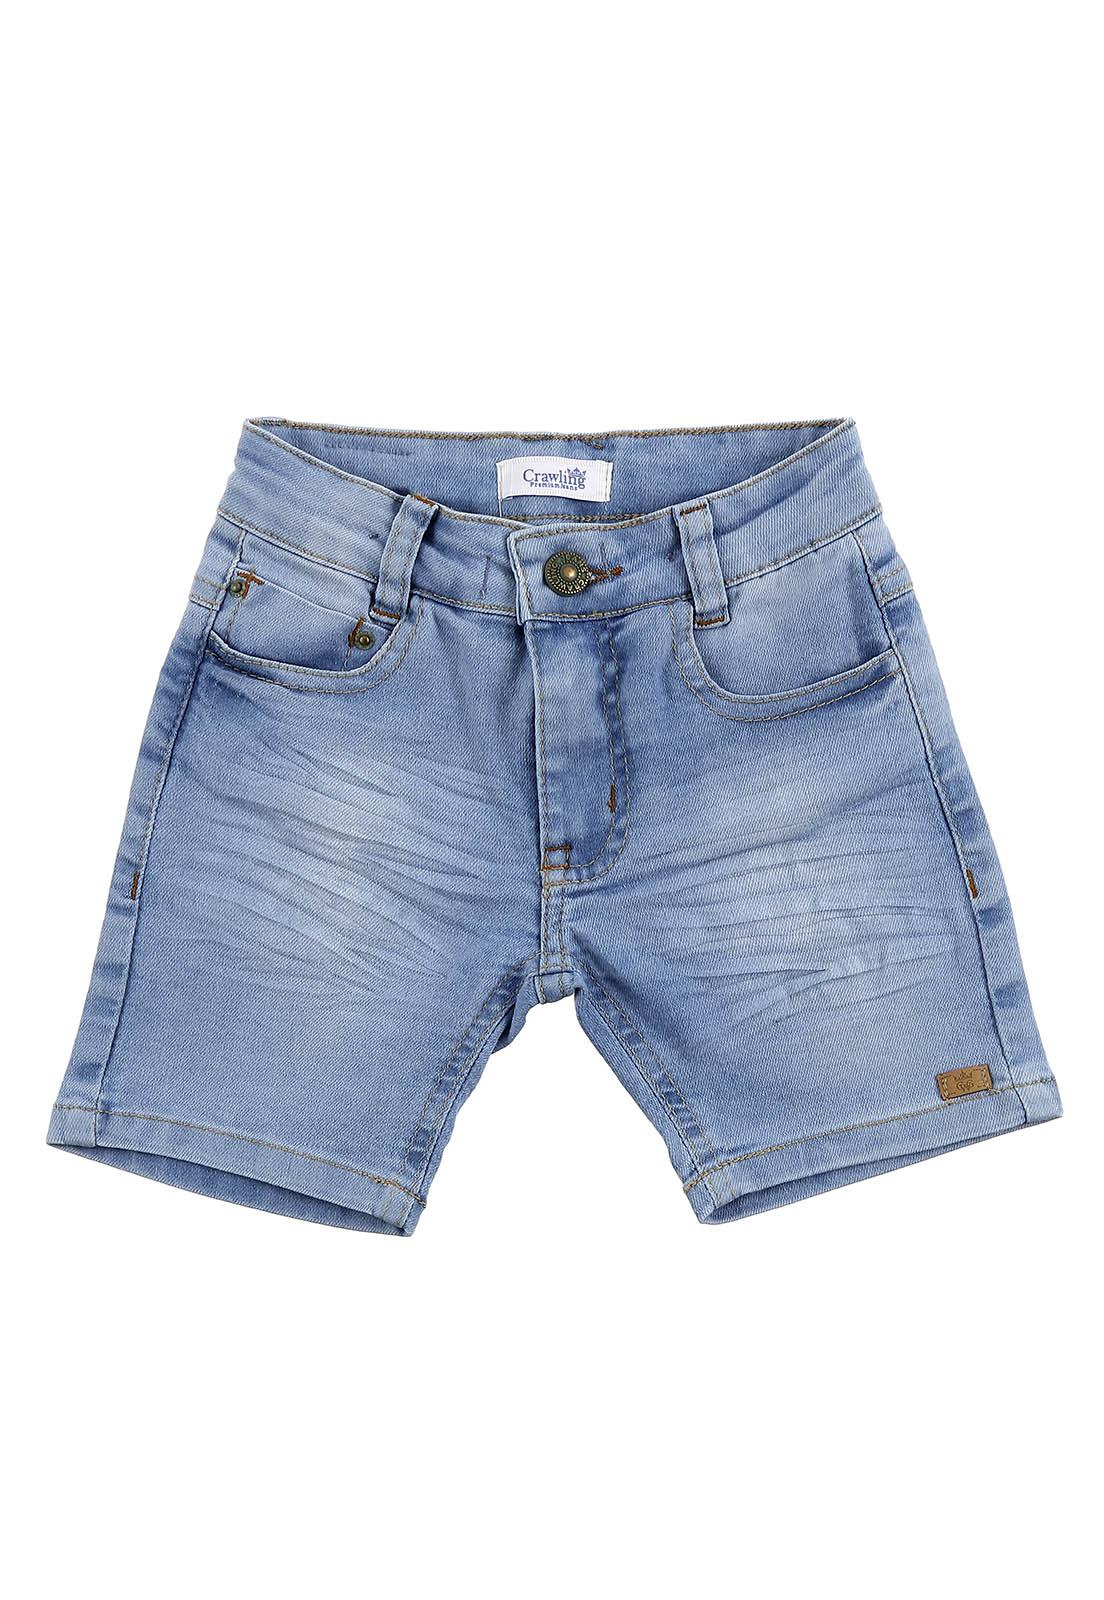 Bermuda Masculina Jeans Baby Boy